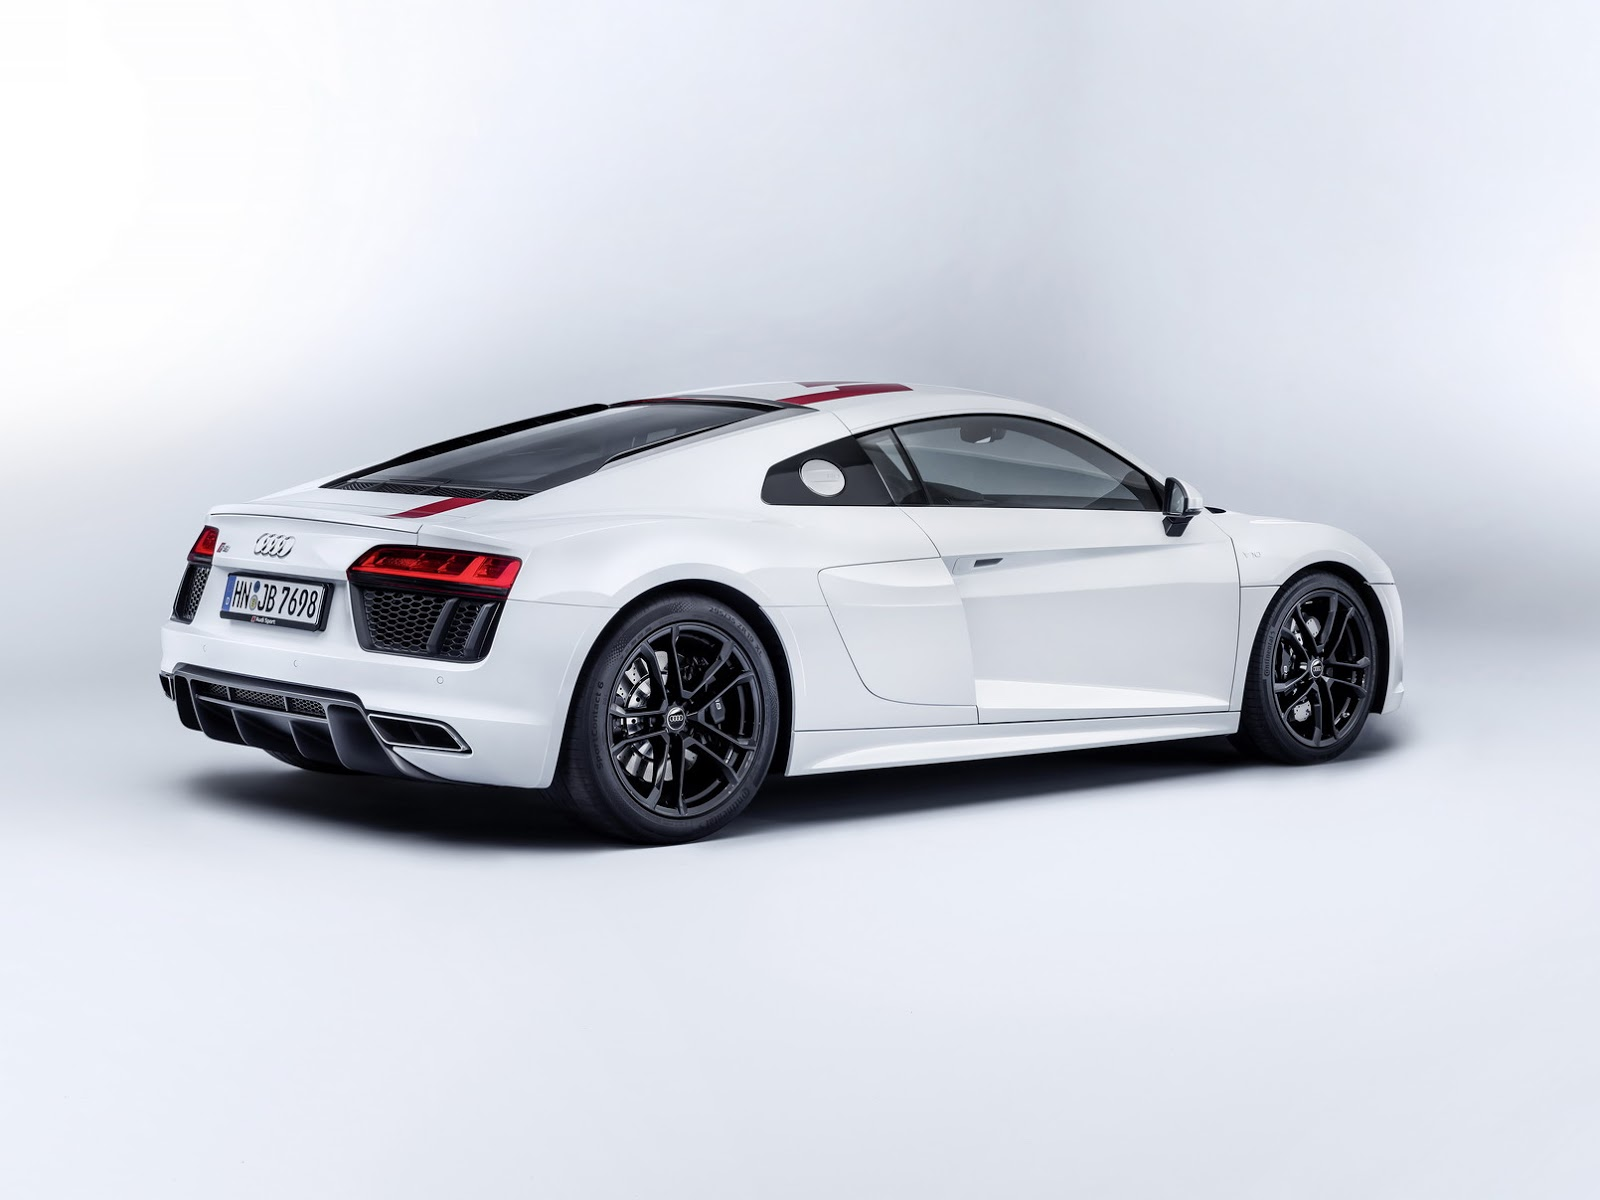 2018_Audi_R8_V10_RWS_65